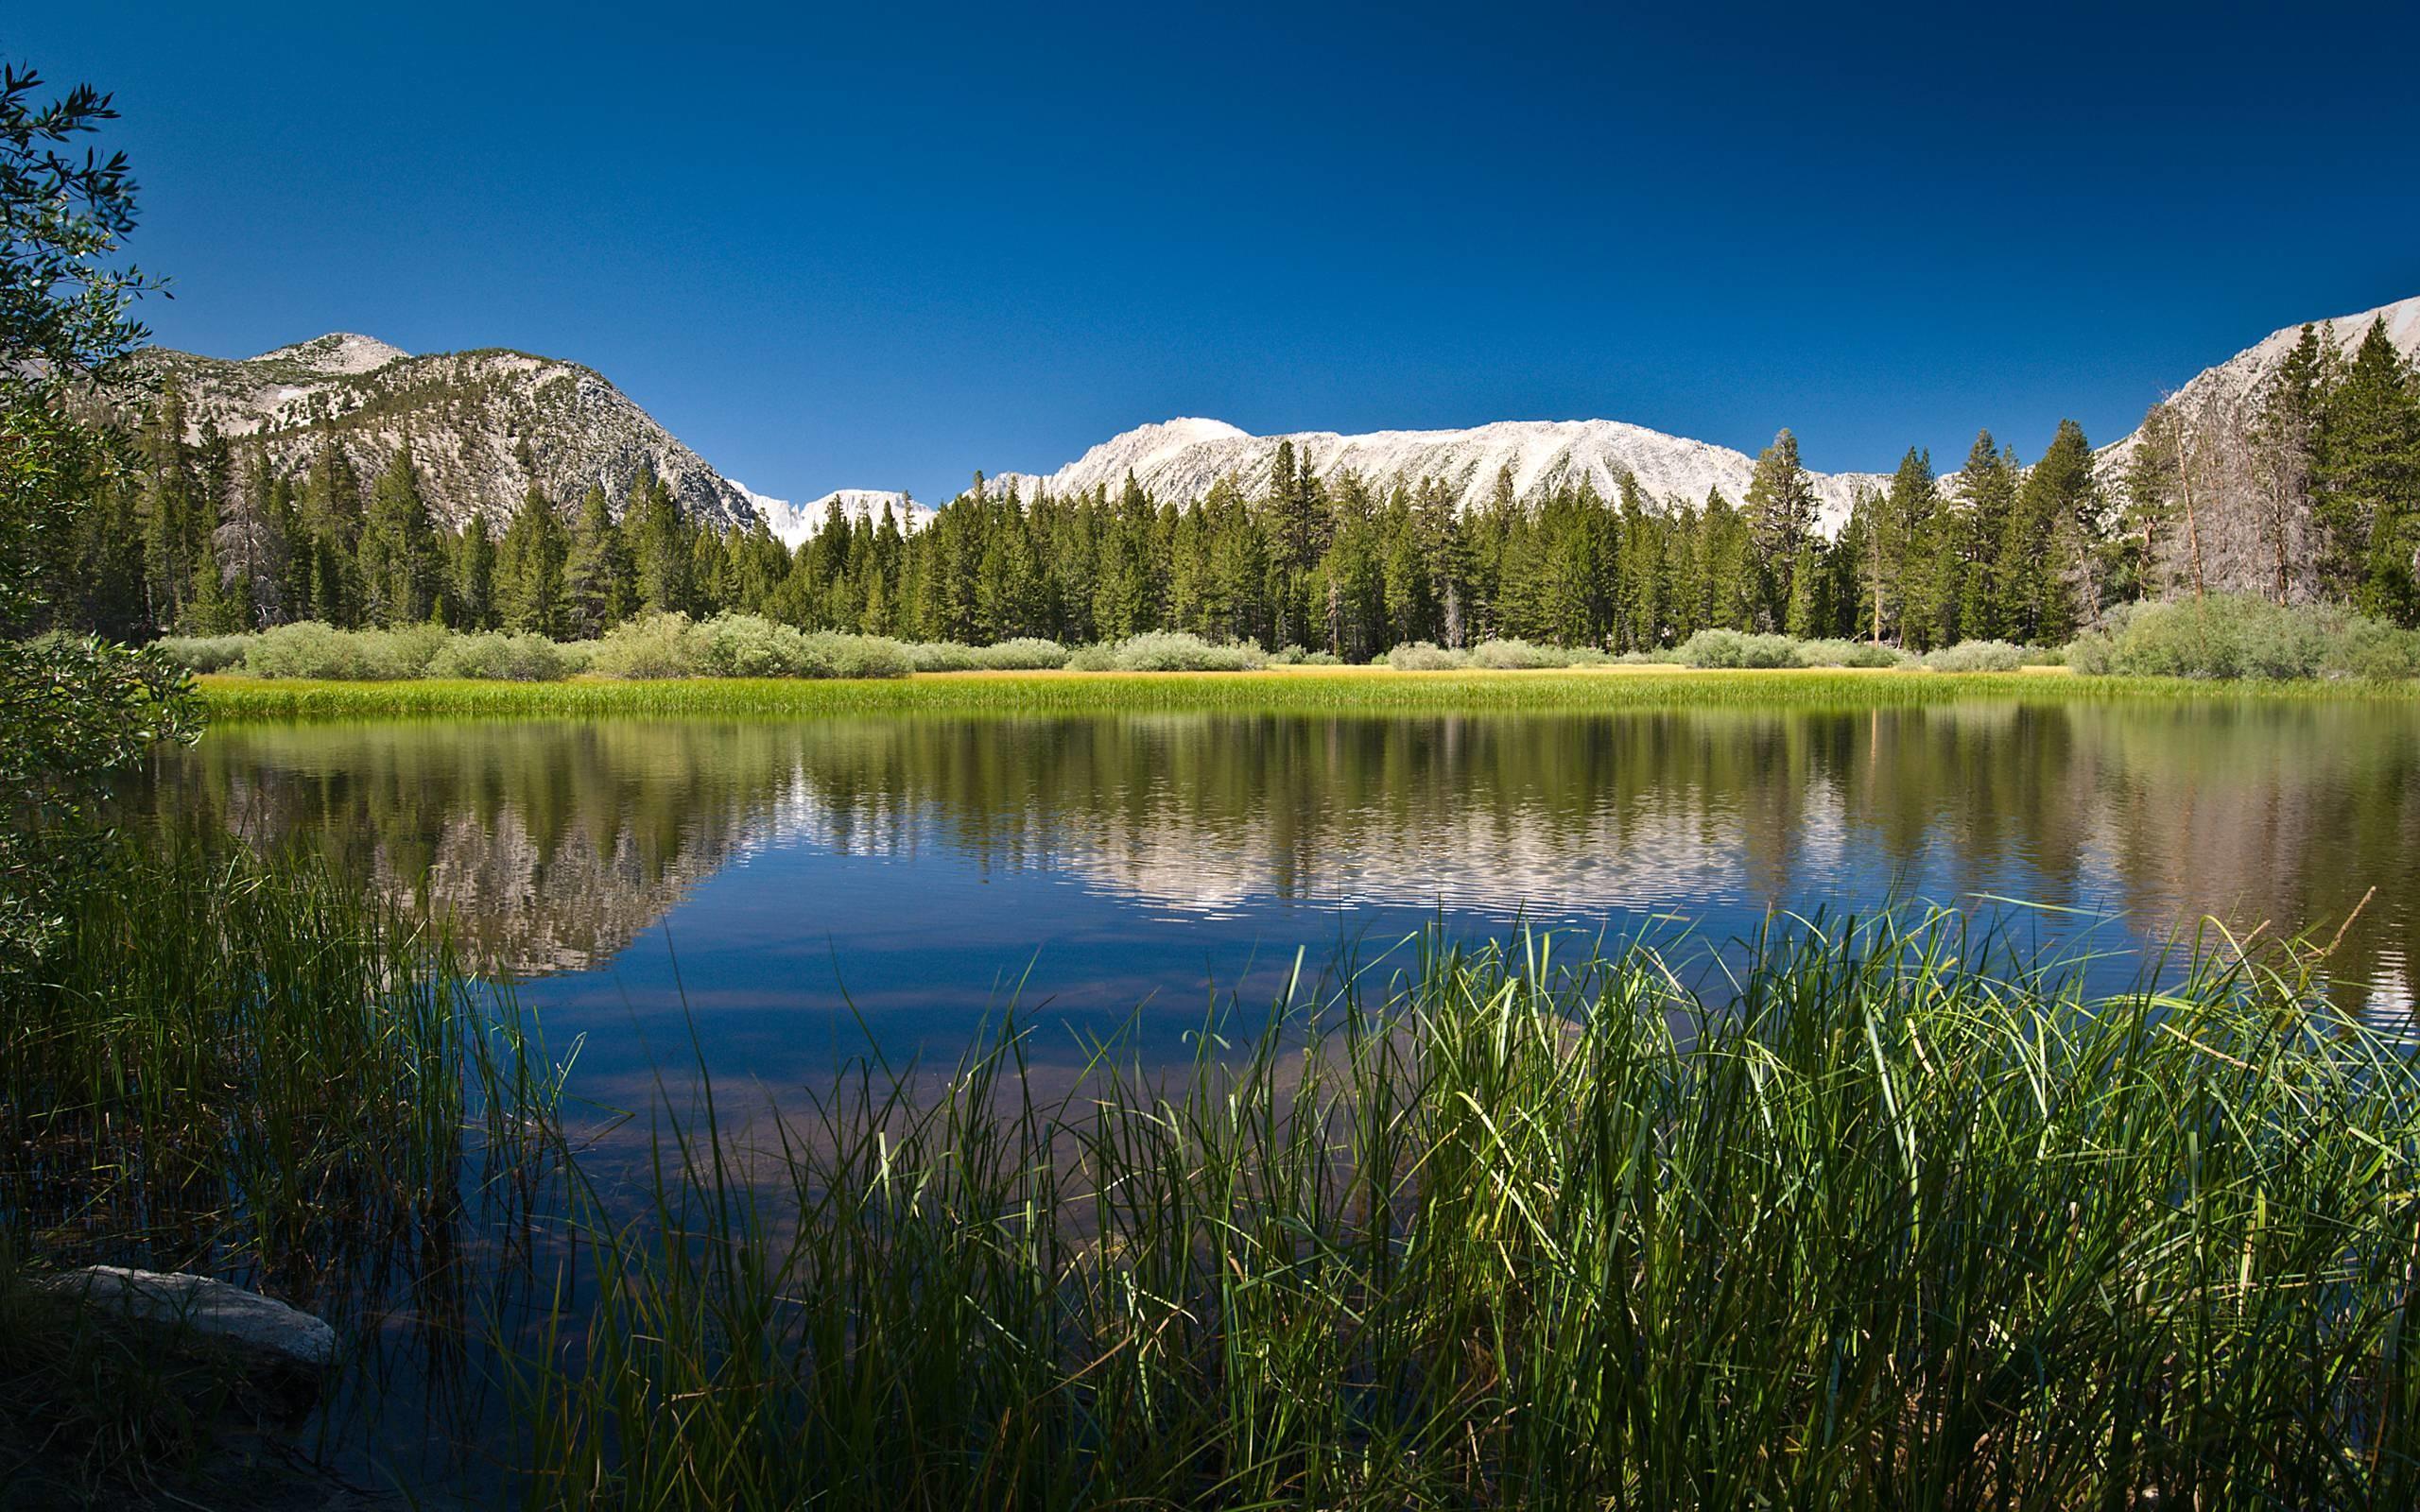 Mountain Lake Hd Free 3d Desktop Wallpaper Pictures Download .